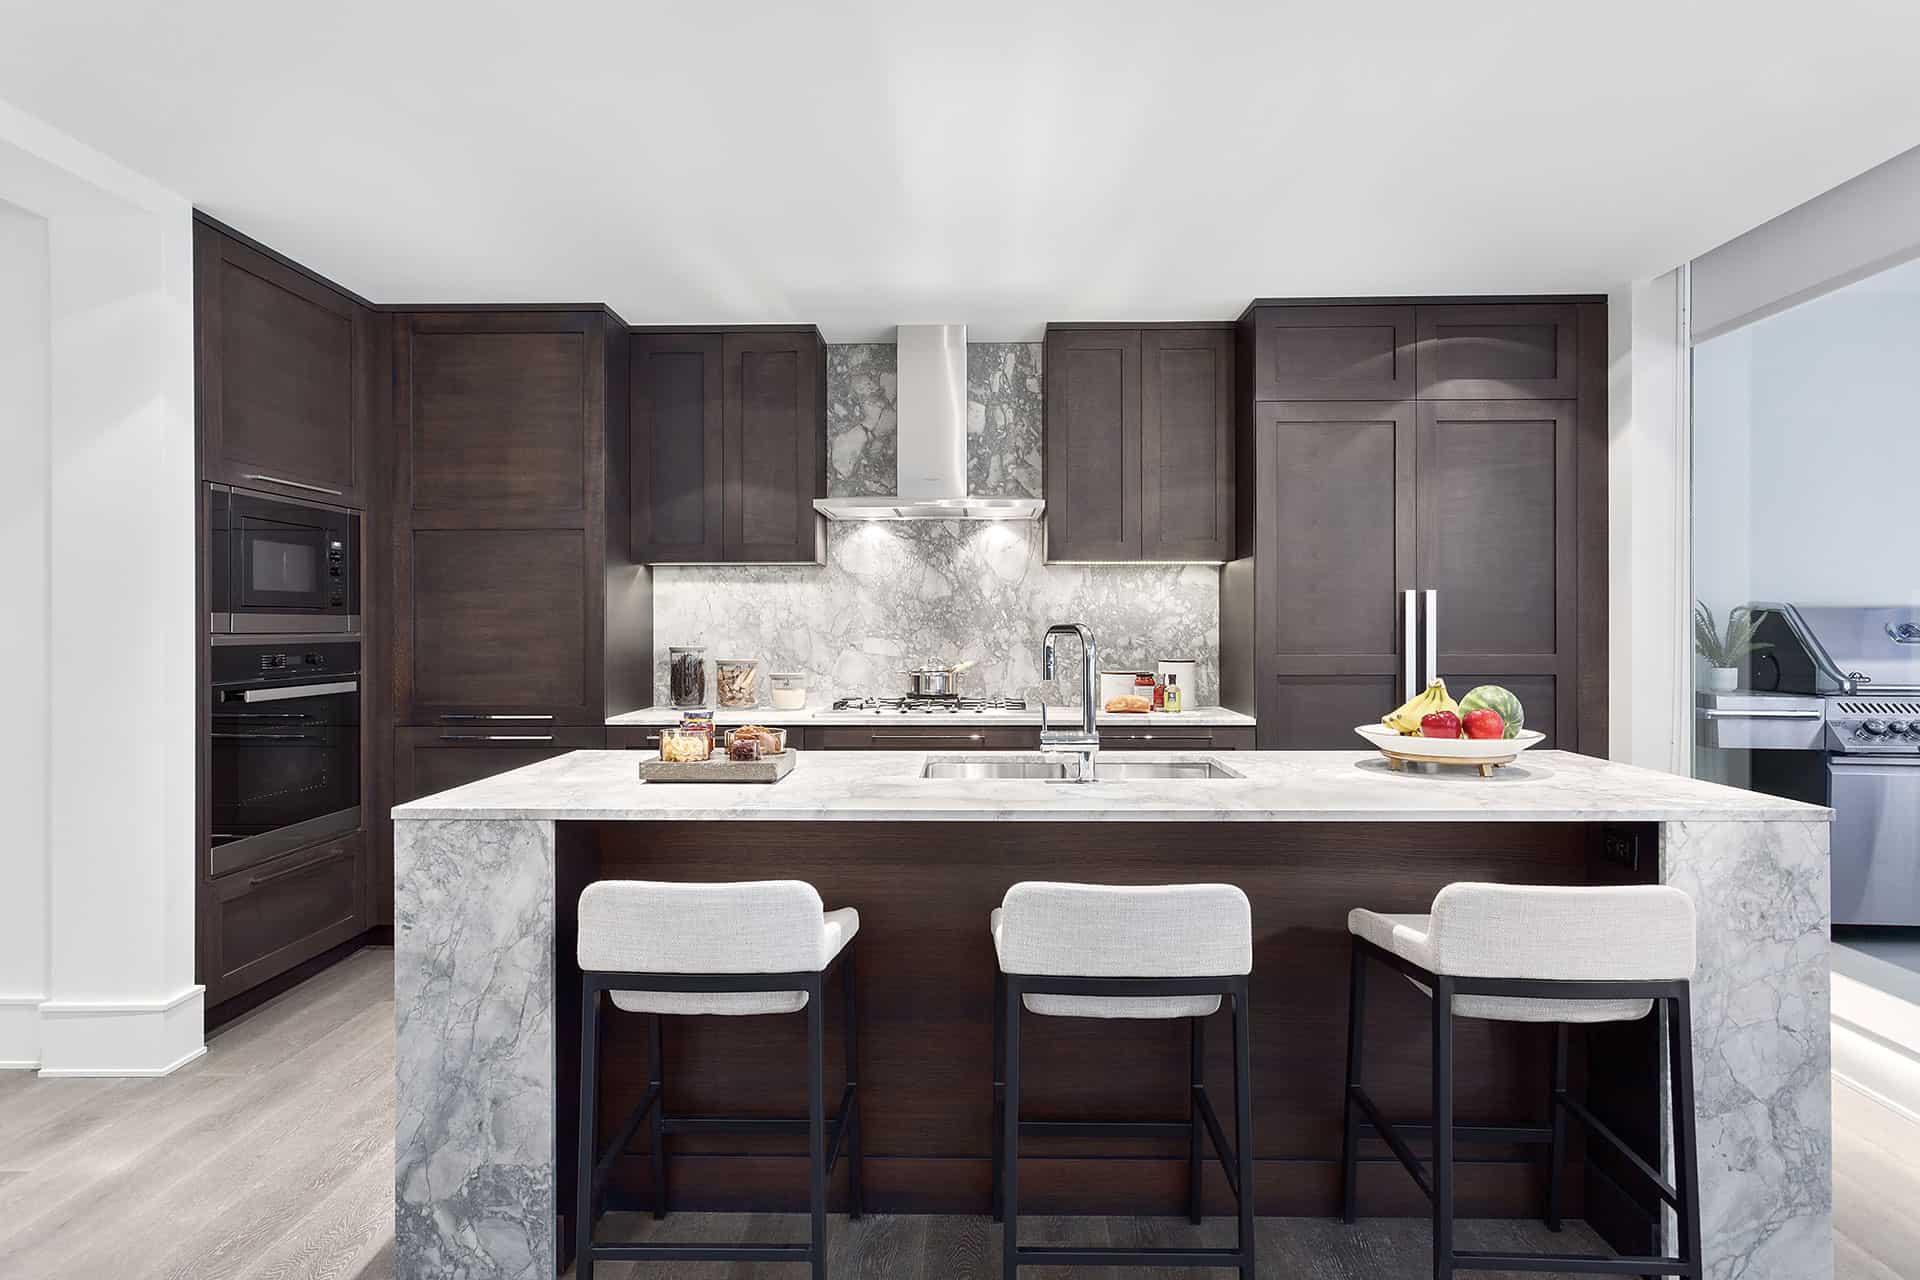 3 Unique Ways to Design an Open-Concept Condo Kitchen - Western Living Magazine